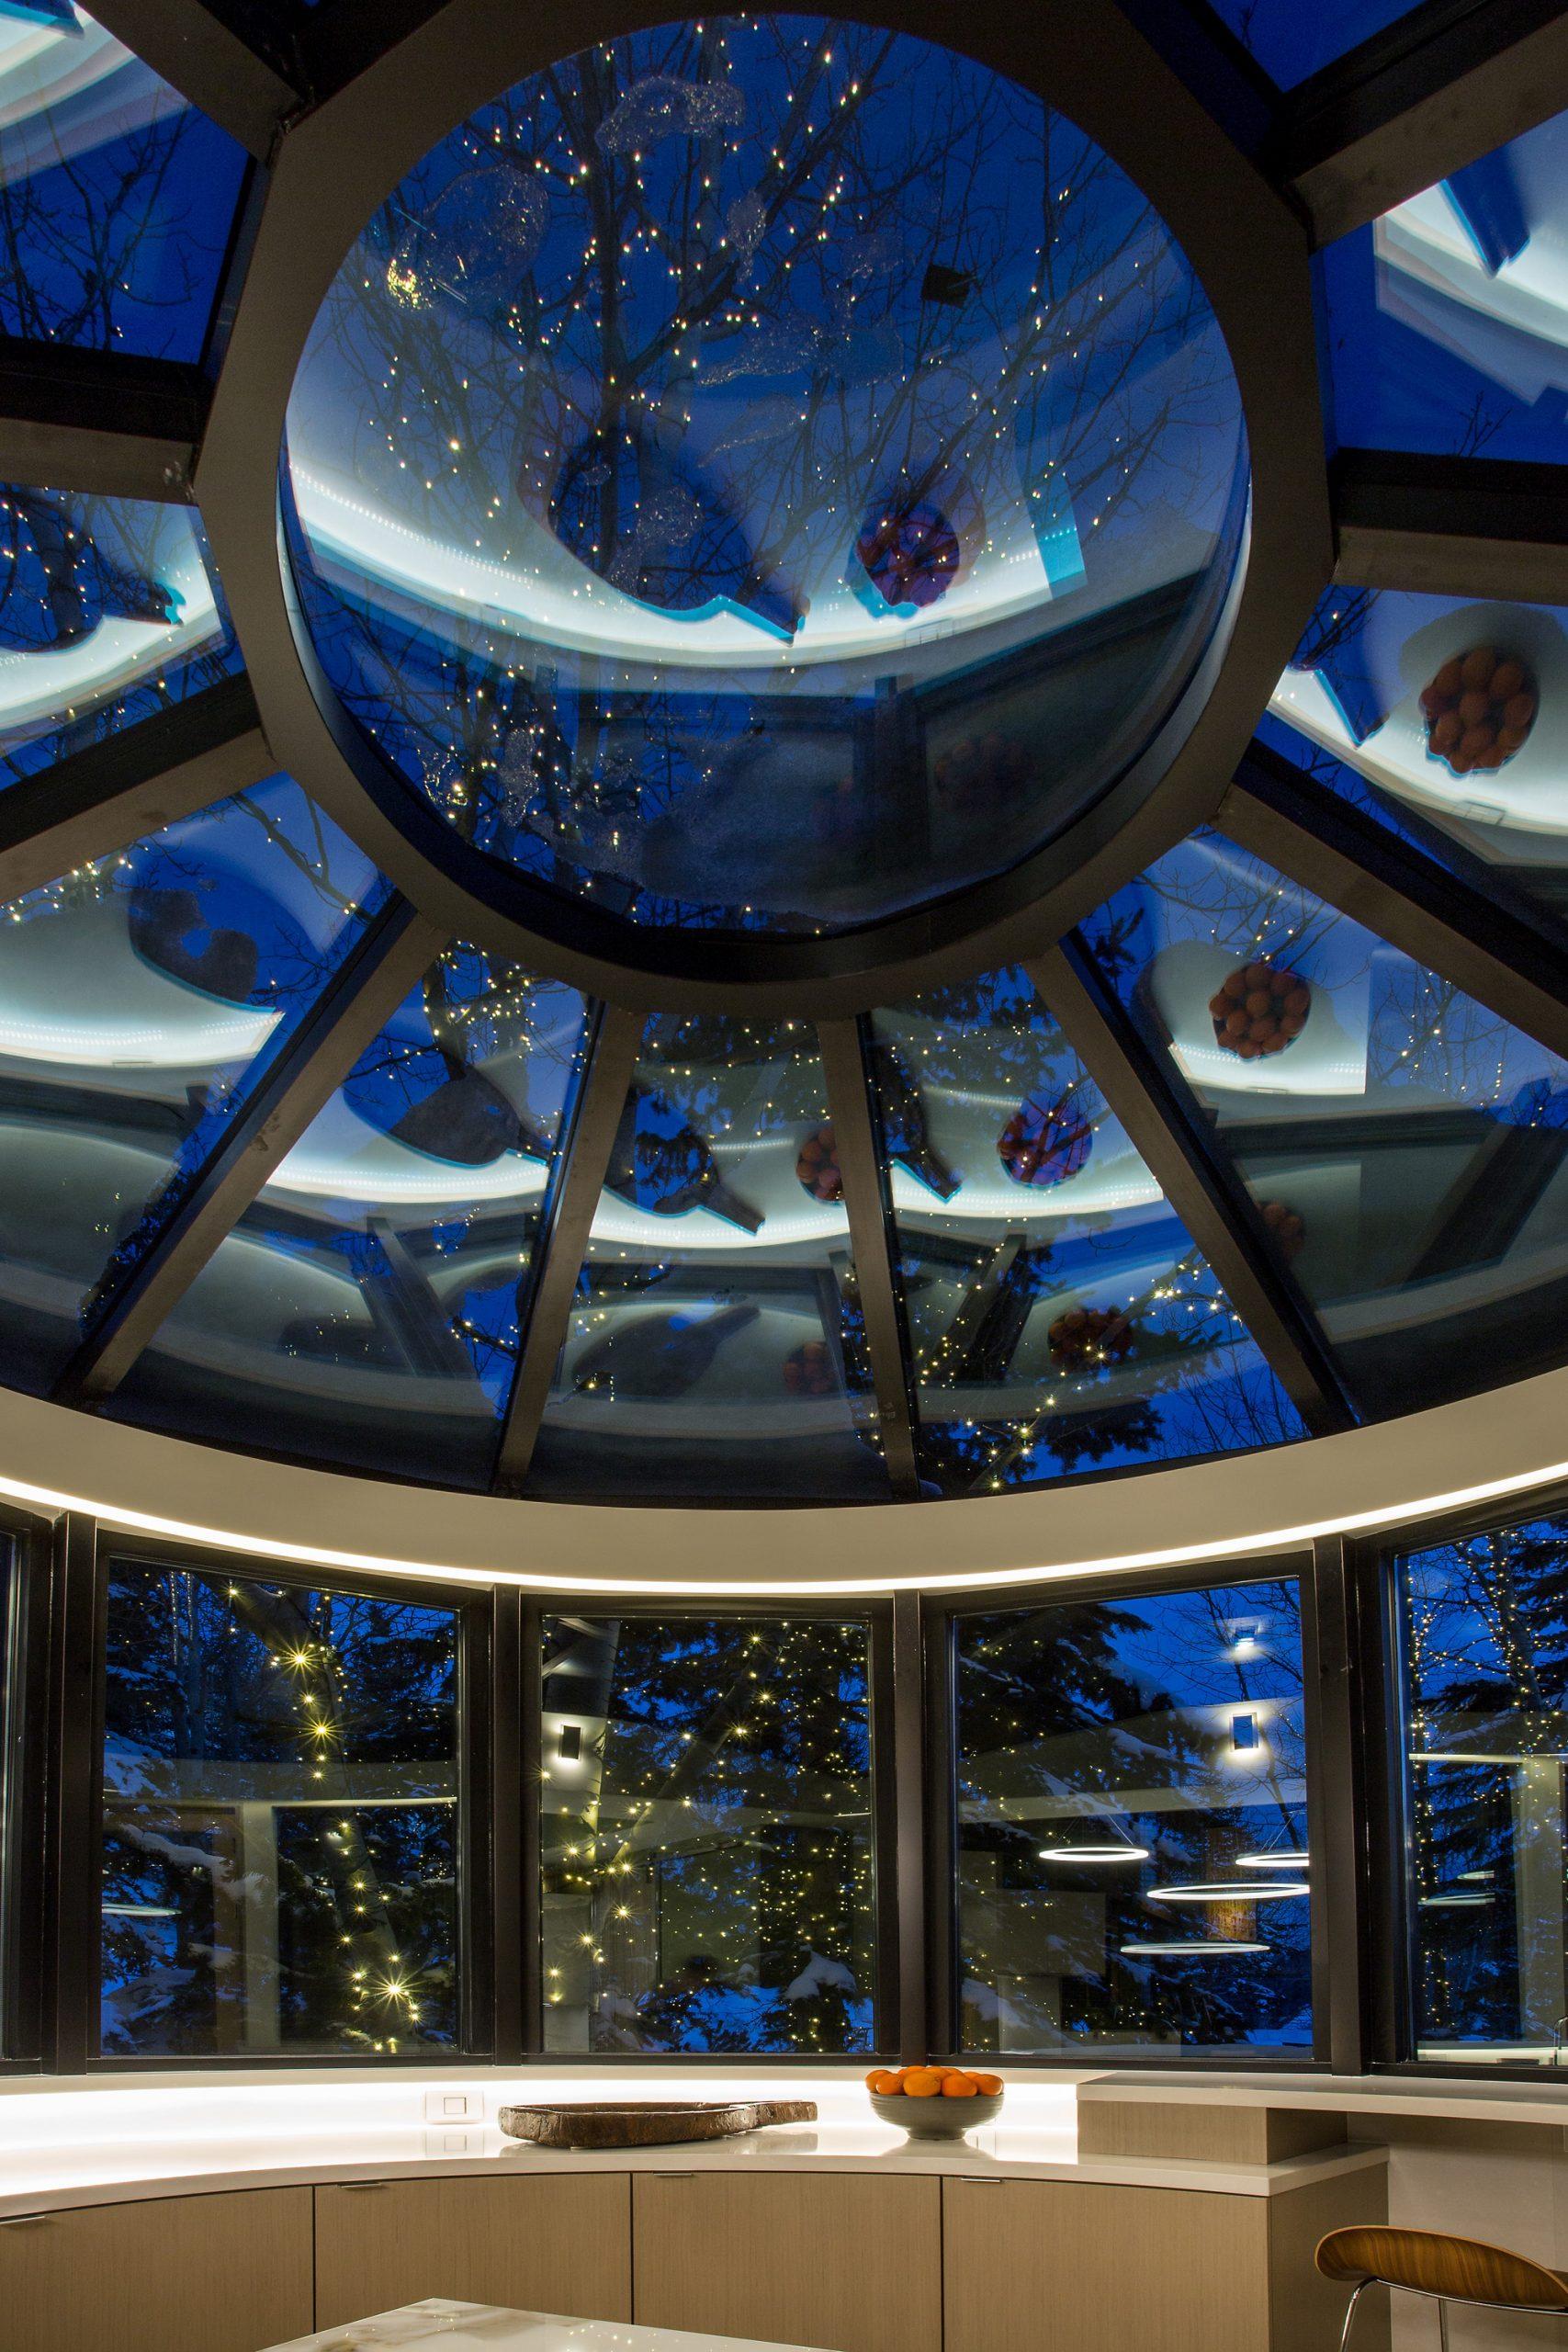 Deer Valley Kitchen Remodel, architecture and interior design by Elliott Workgroup